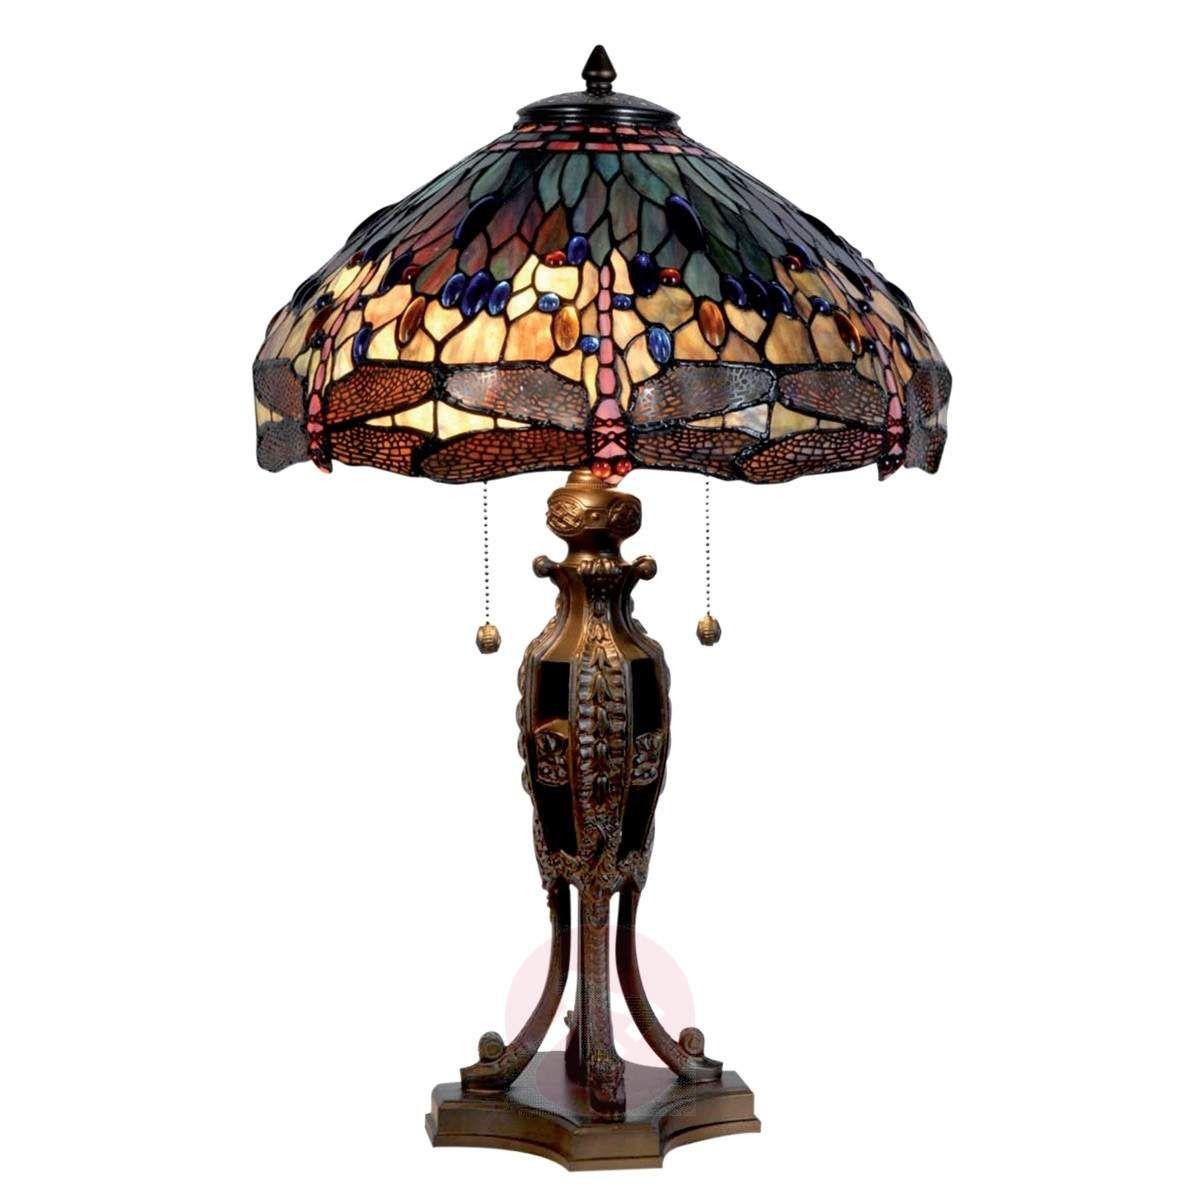 Jungle stor bordlampe i Tiffany-stil-6064026-30